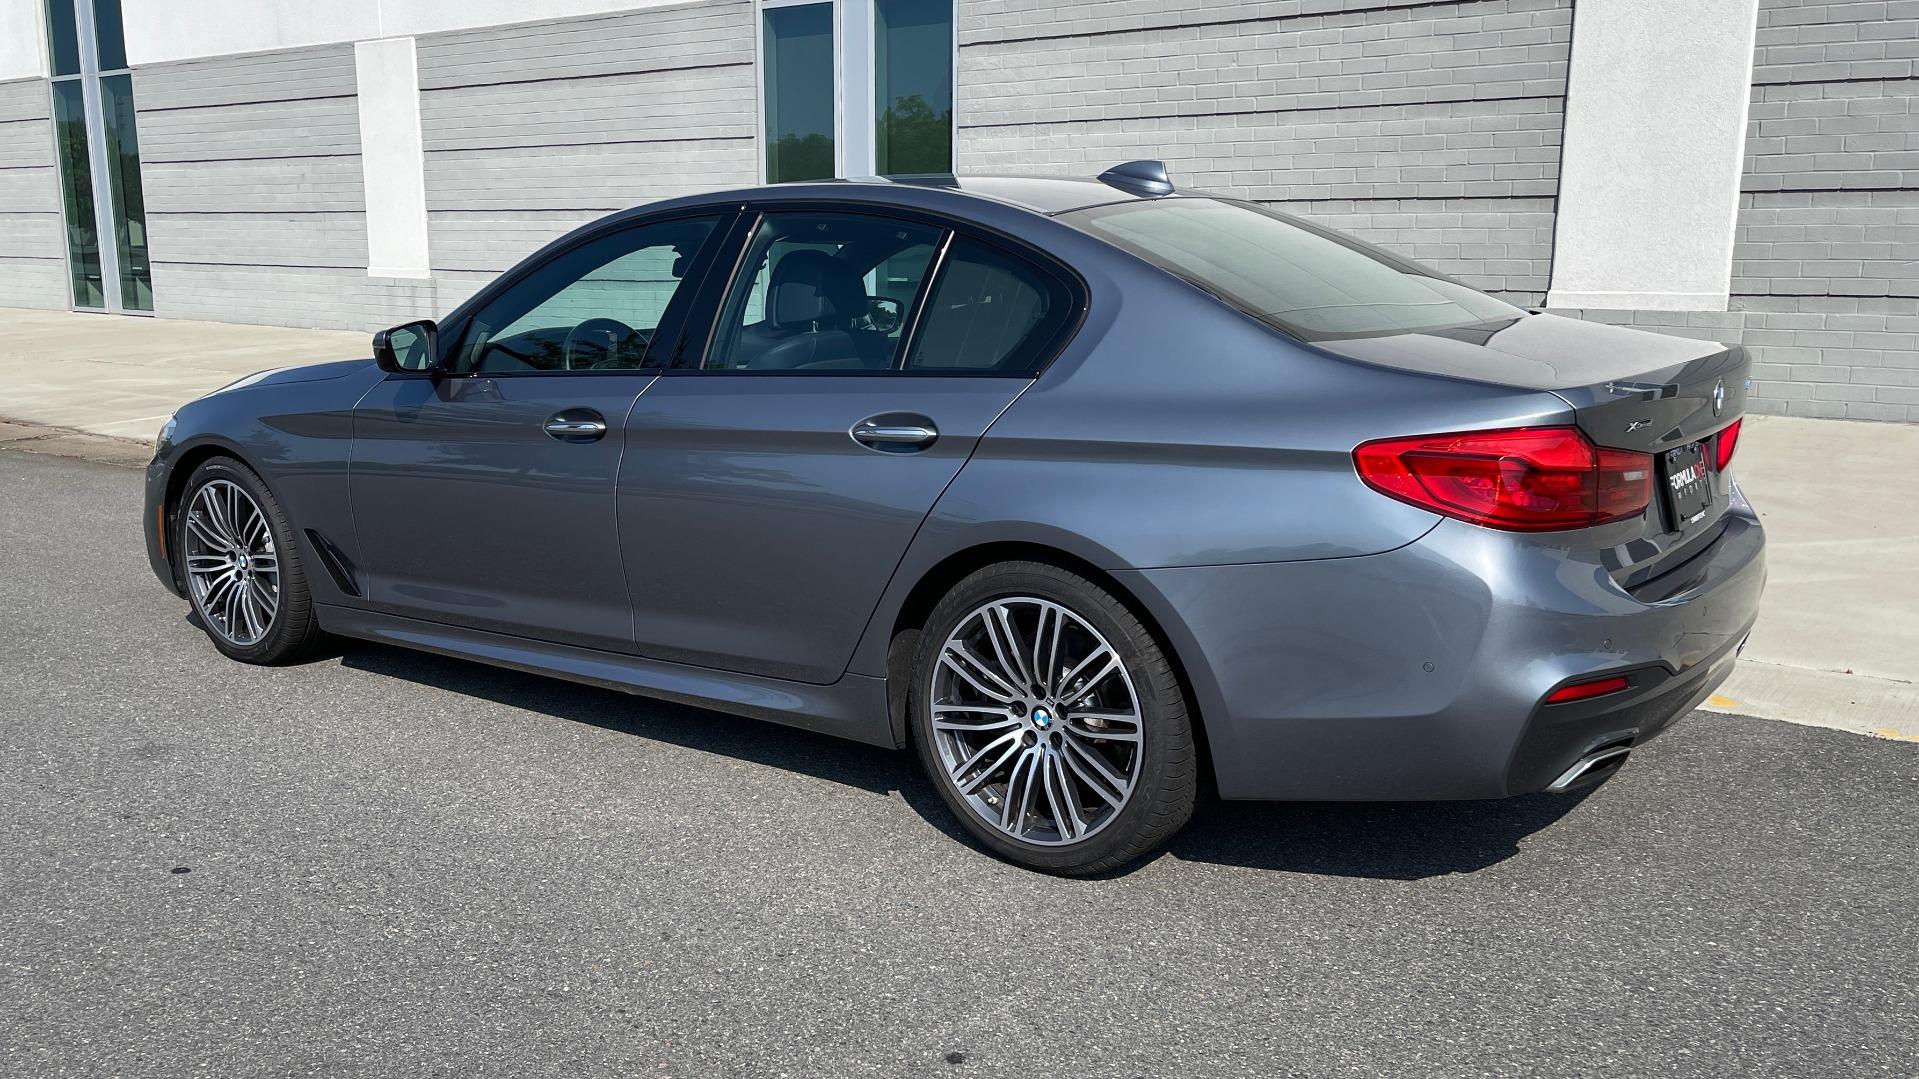 Used 2018 BMW 5 SERIES 540I XDRIVE M-SPORT / DRVR ASST / PDC / APPLE / HUD / H/K SND for sale $42,795 at Formula Imports in Charlotte NC 28227 5